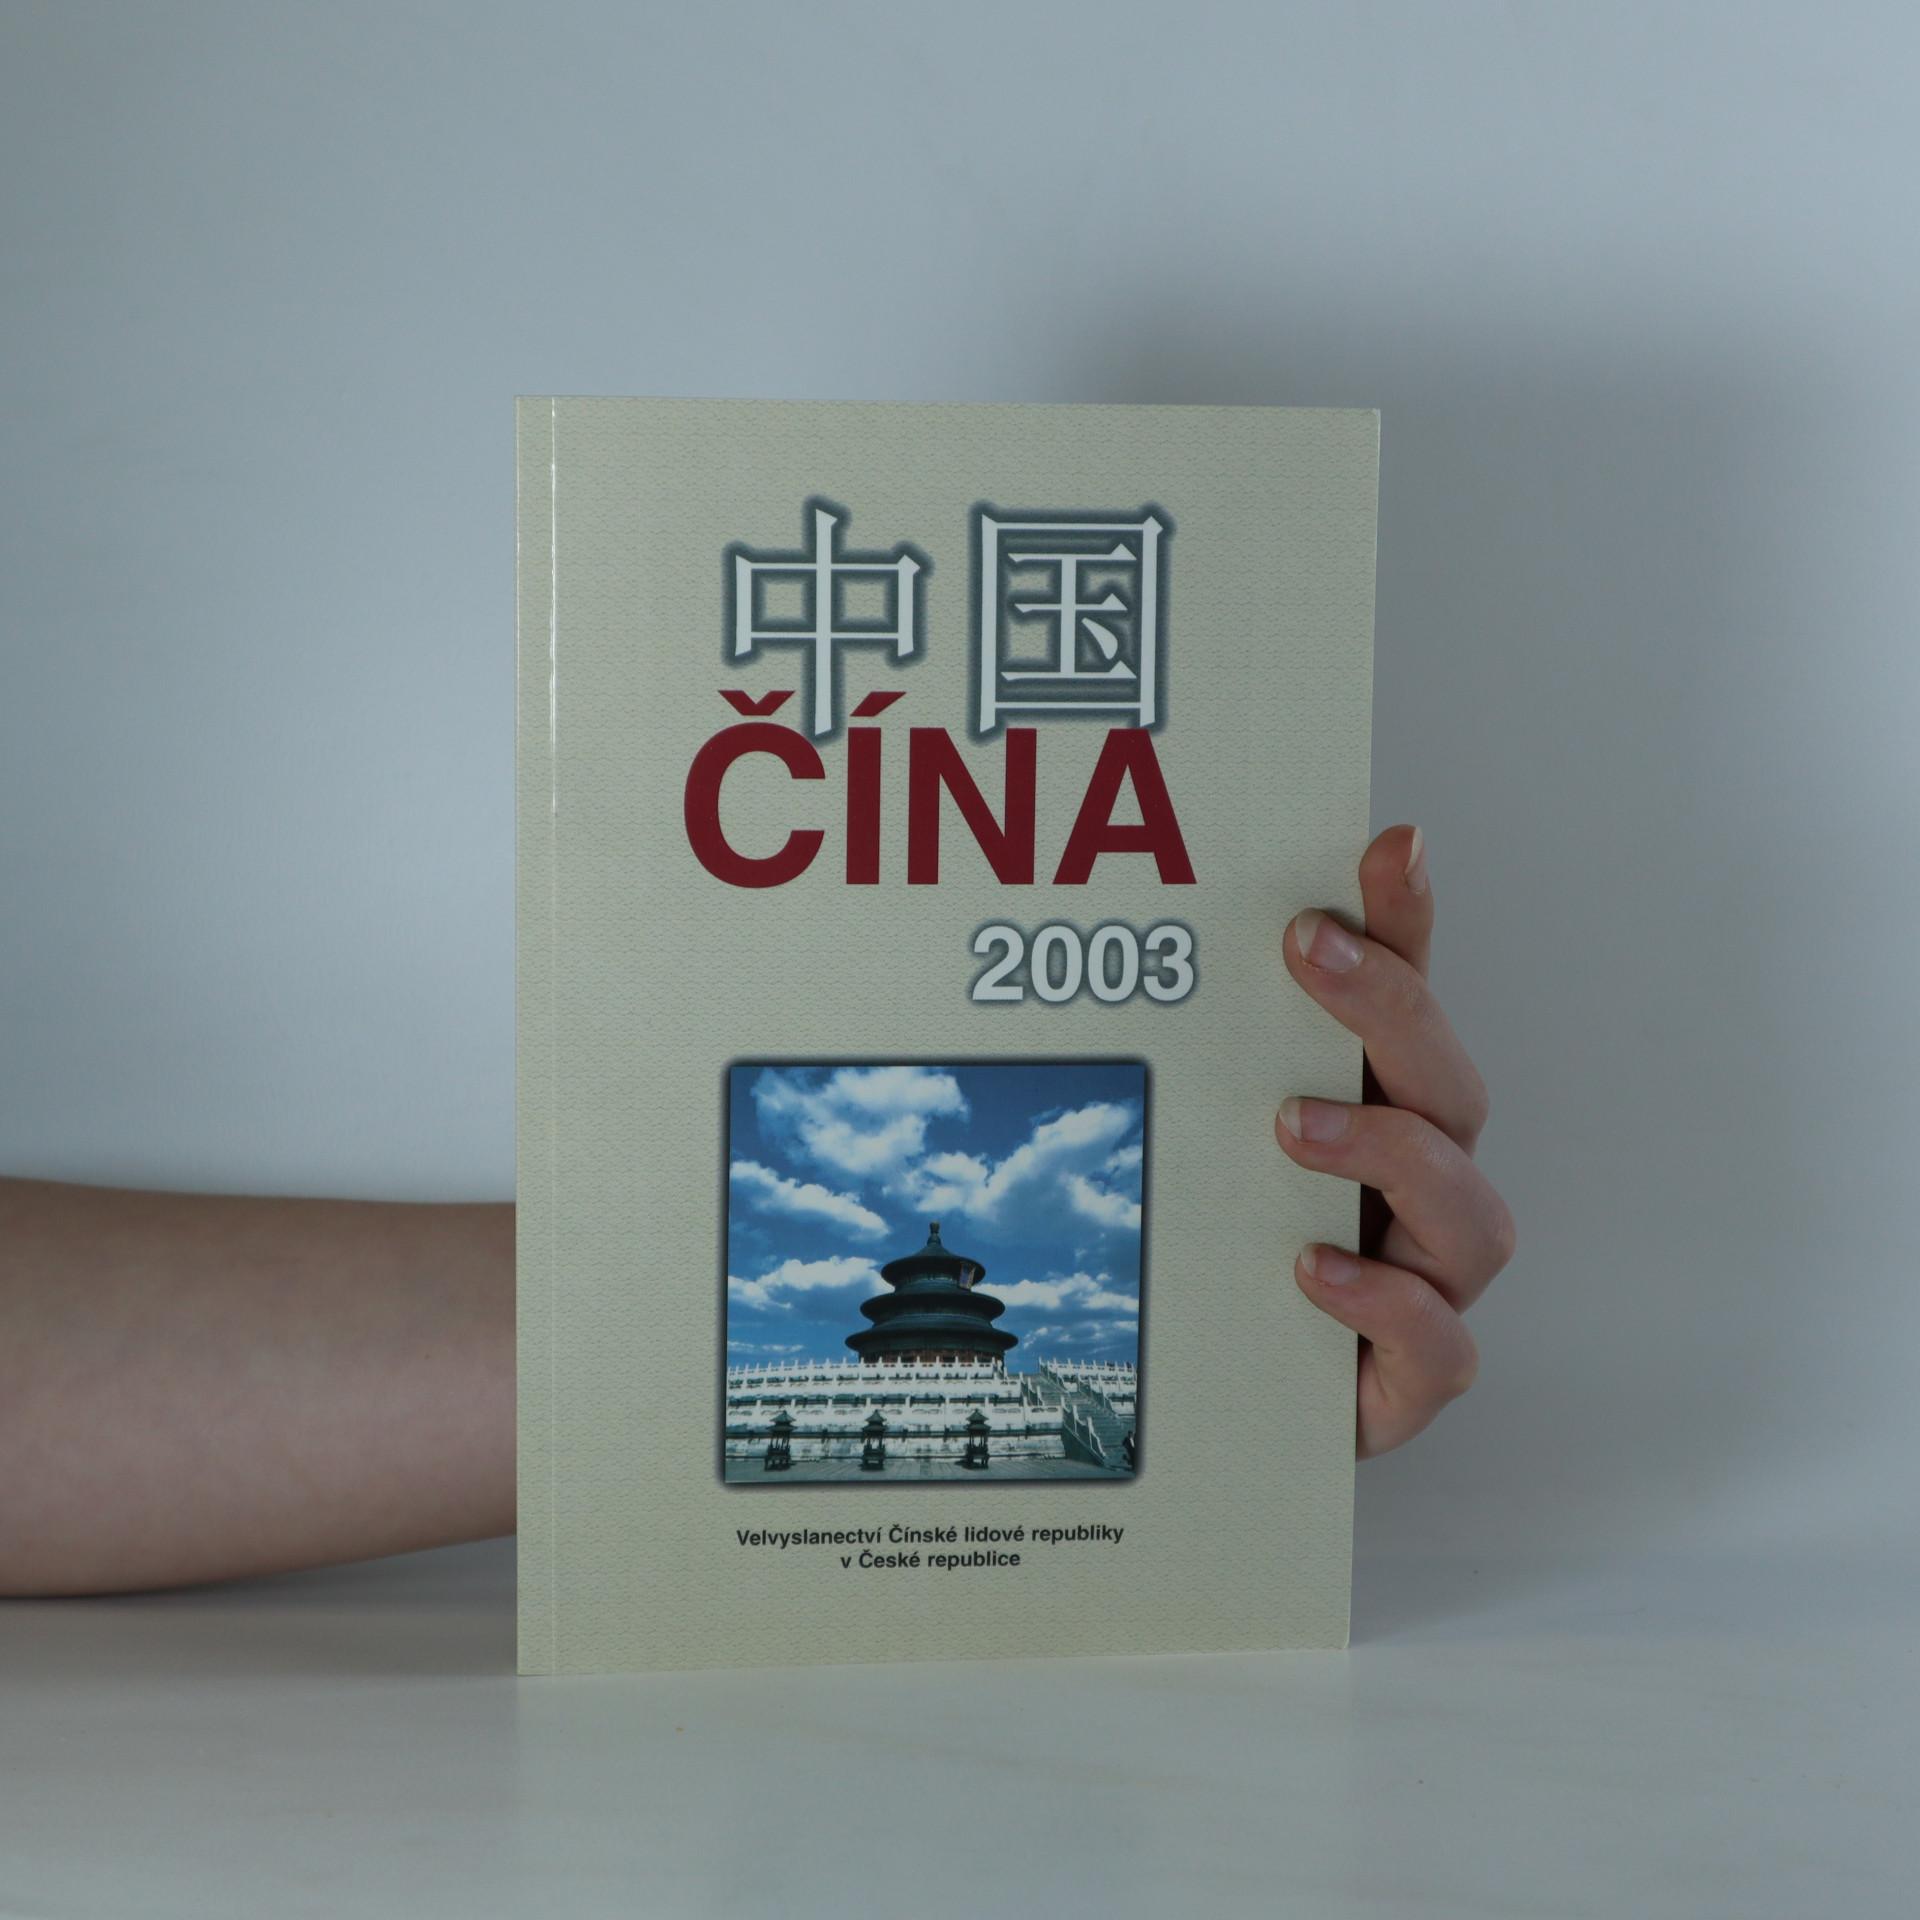 antikvární kniha Čína, 2003